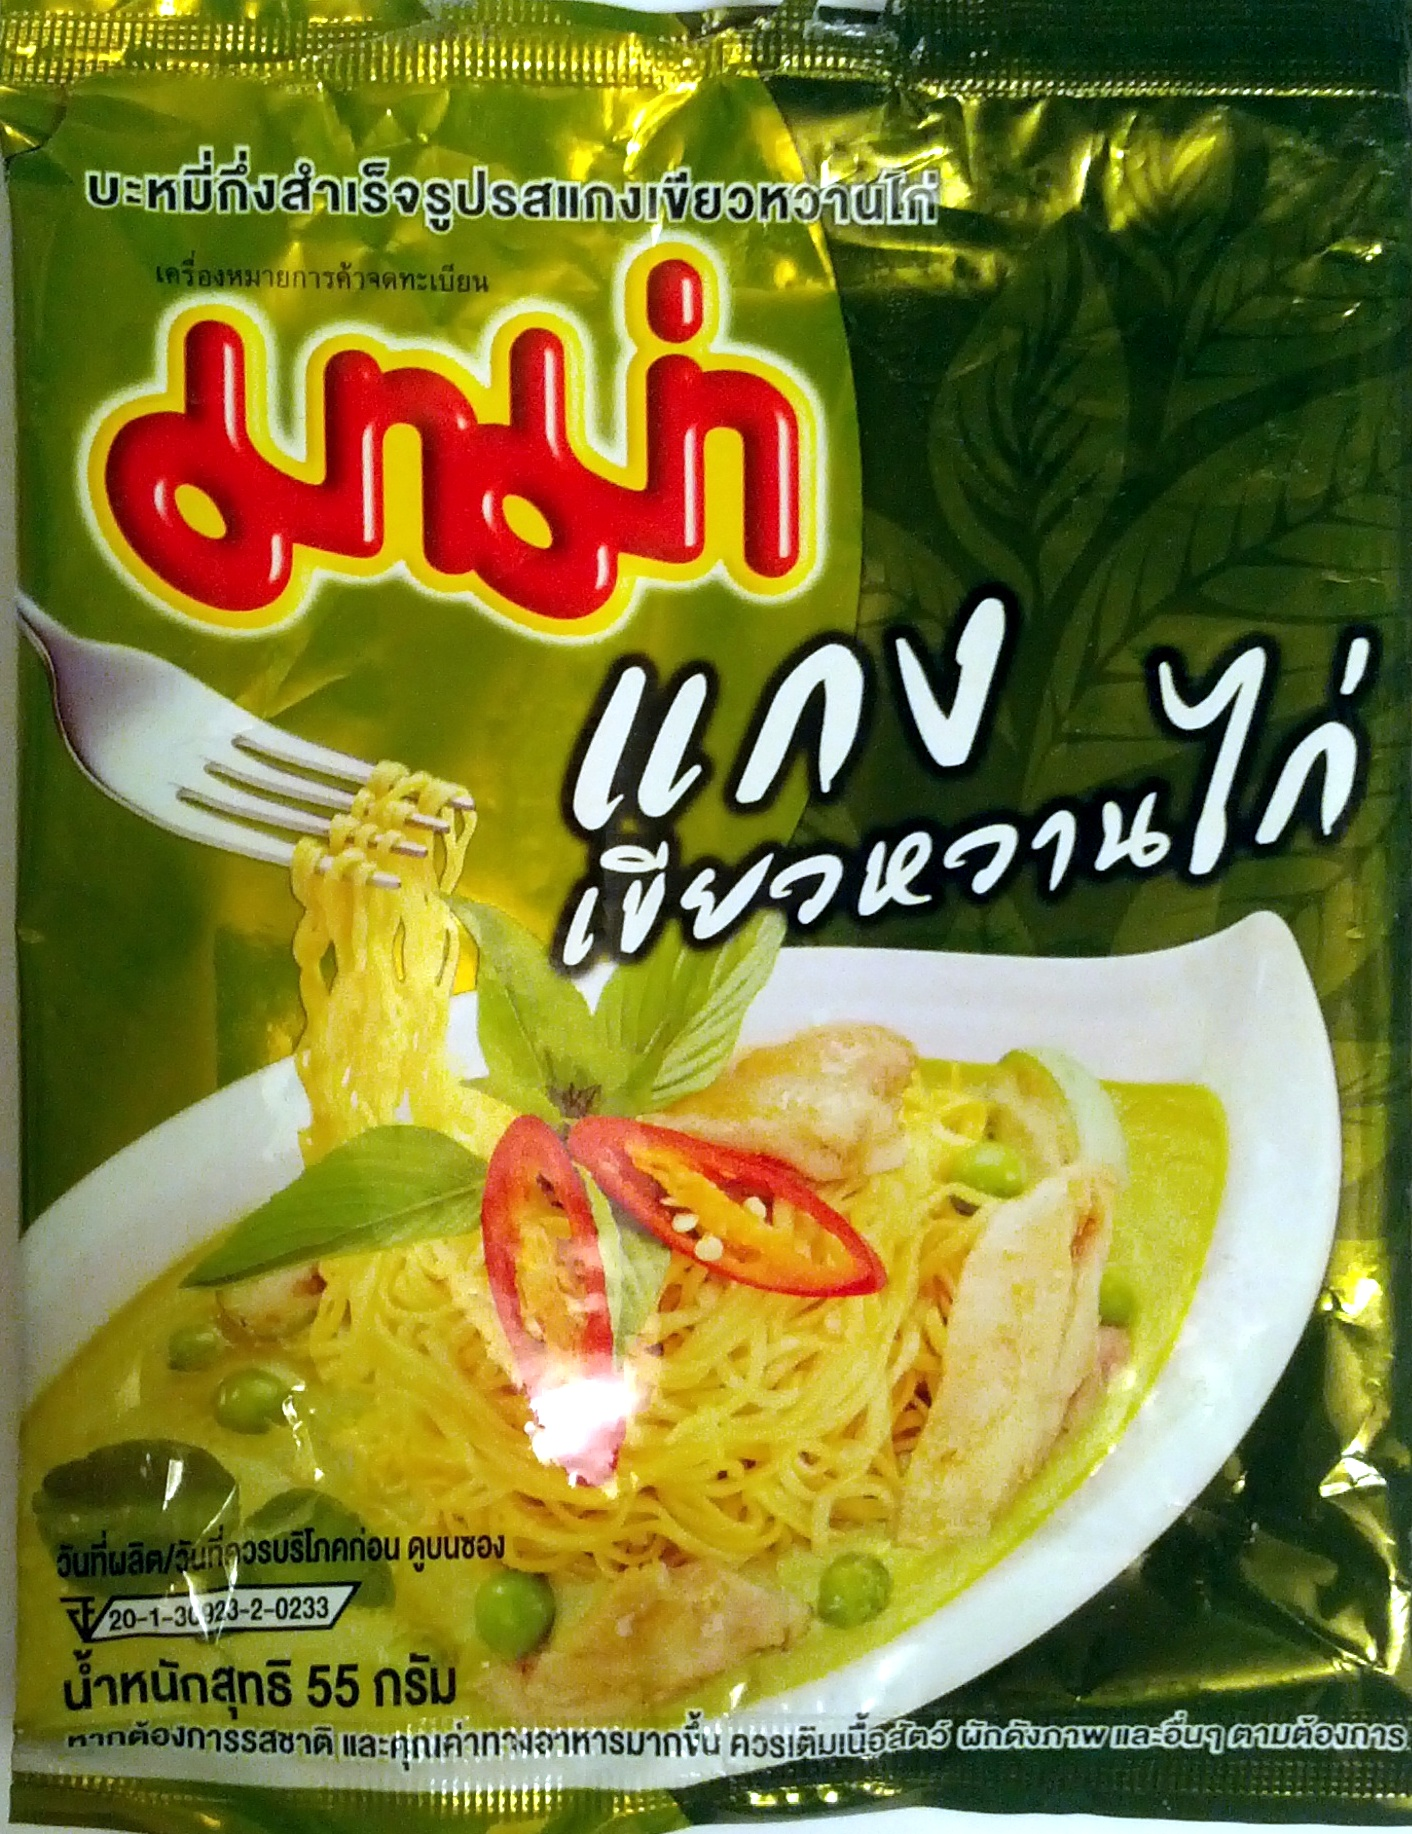 Instant Noodles Chicken Green Curry Flavor - Product - en